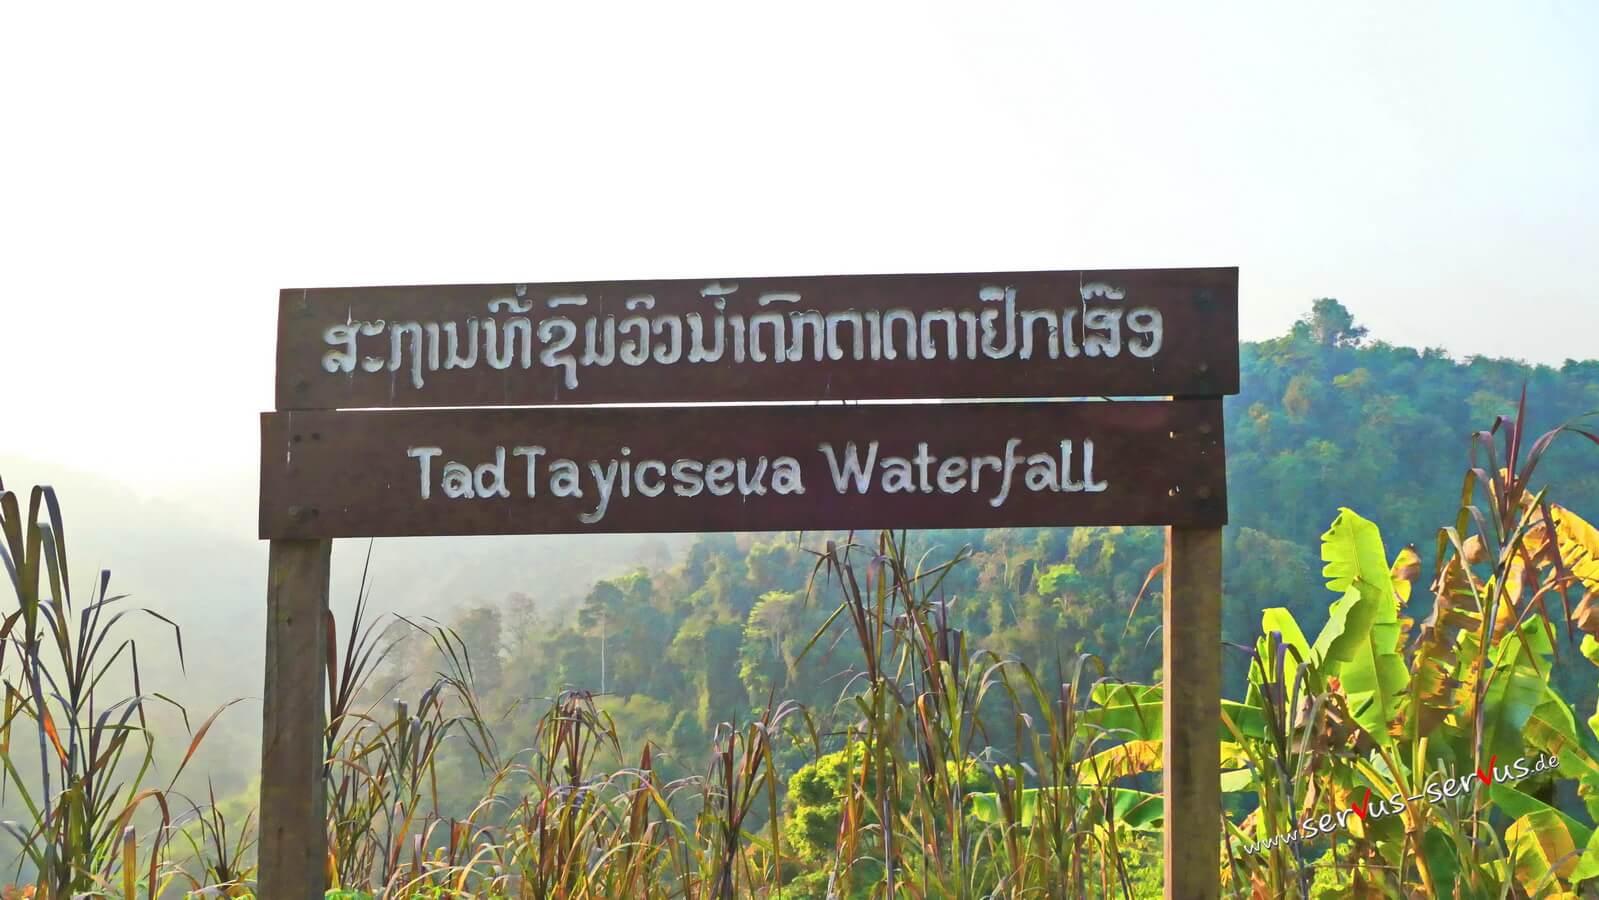 Tad Tayicseua Wasserfall, Laos,Bbolaven